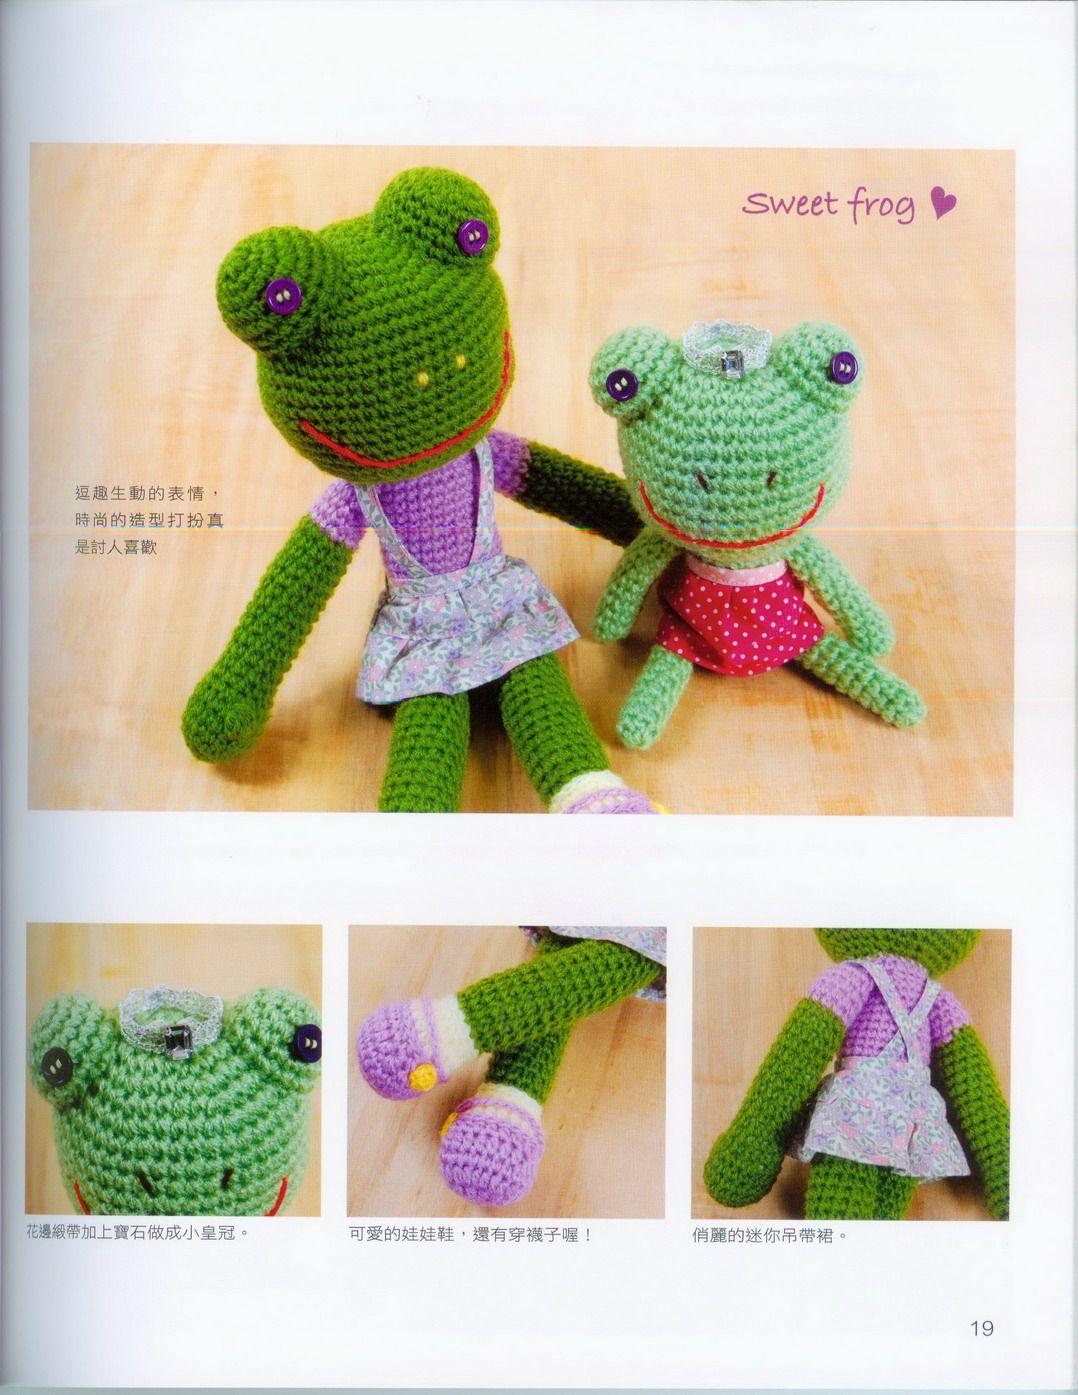 Sweet frog amigurumi pattern (3) - free cross stitch patterns ... | 1395x1078